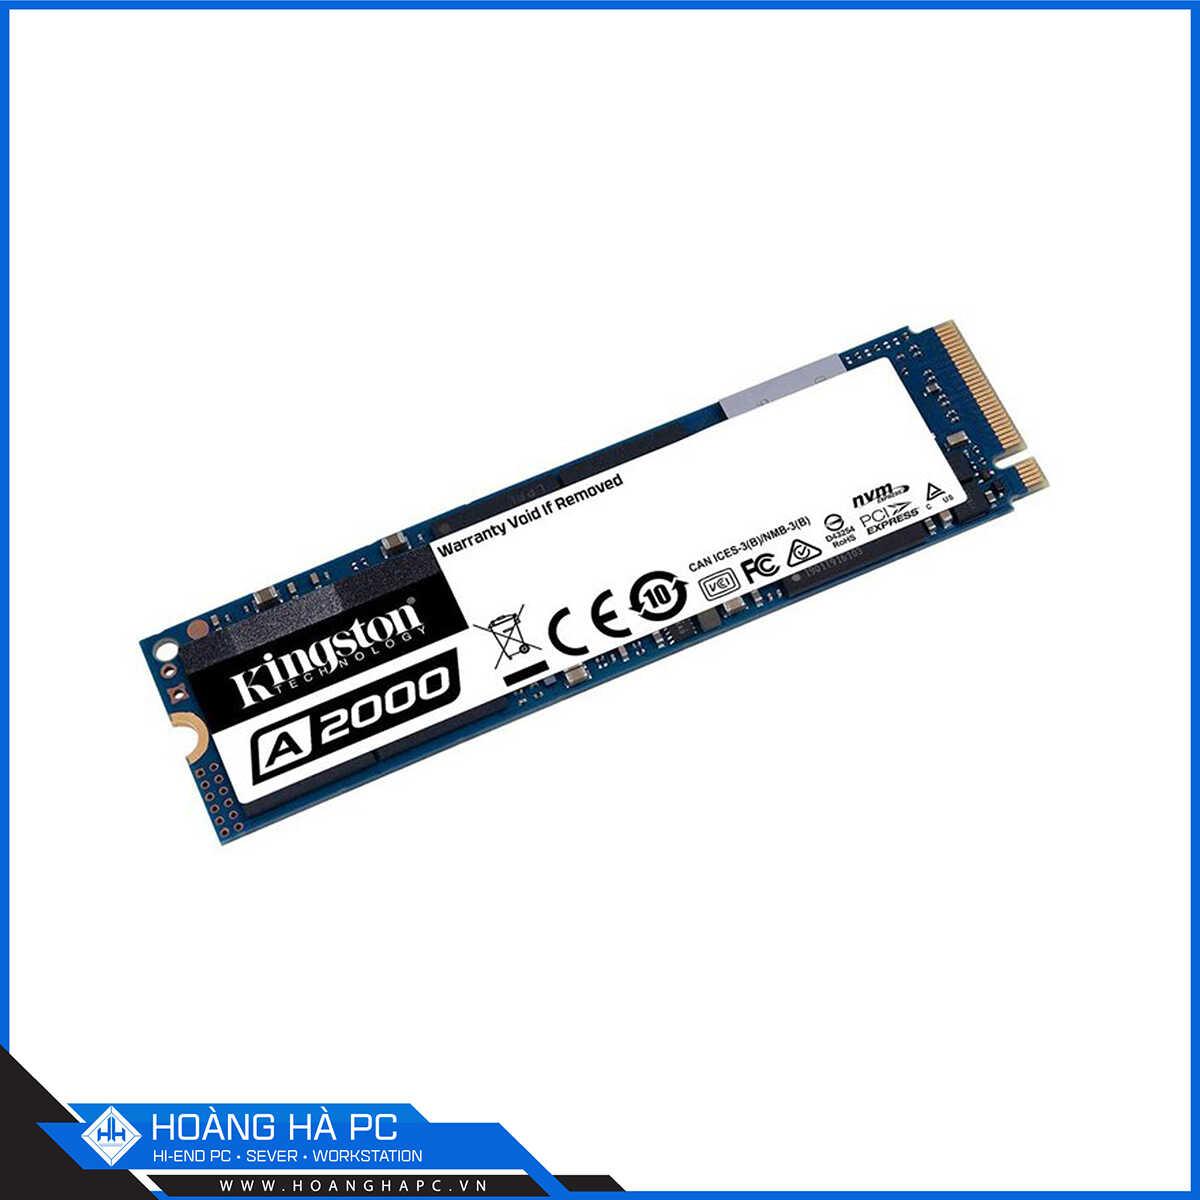 SSD KINGSTON A2000 250GB M.2 2280